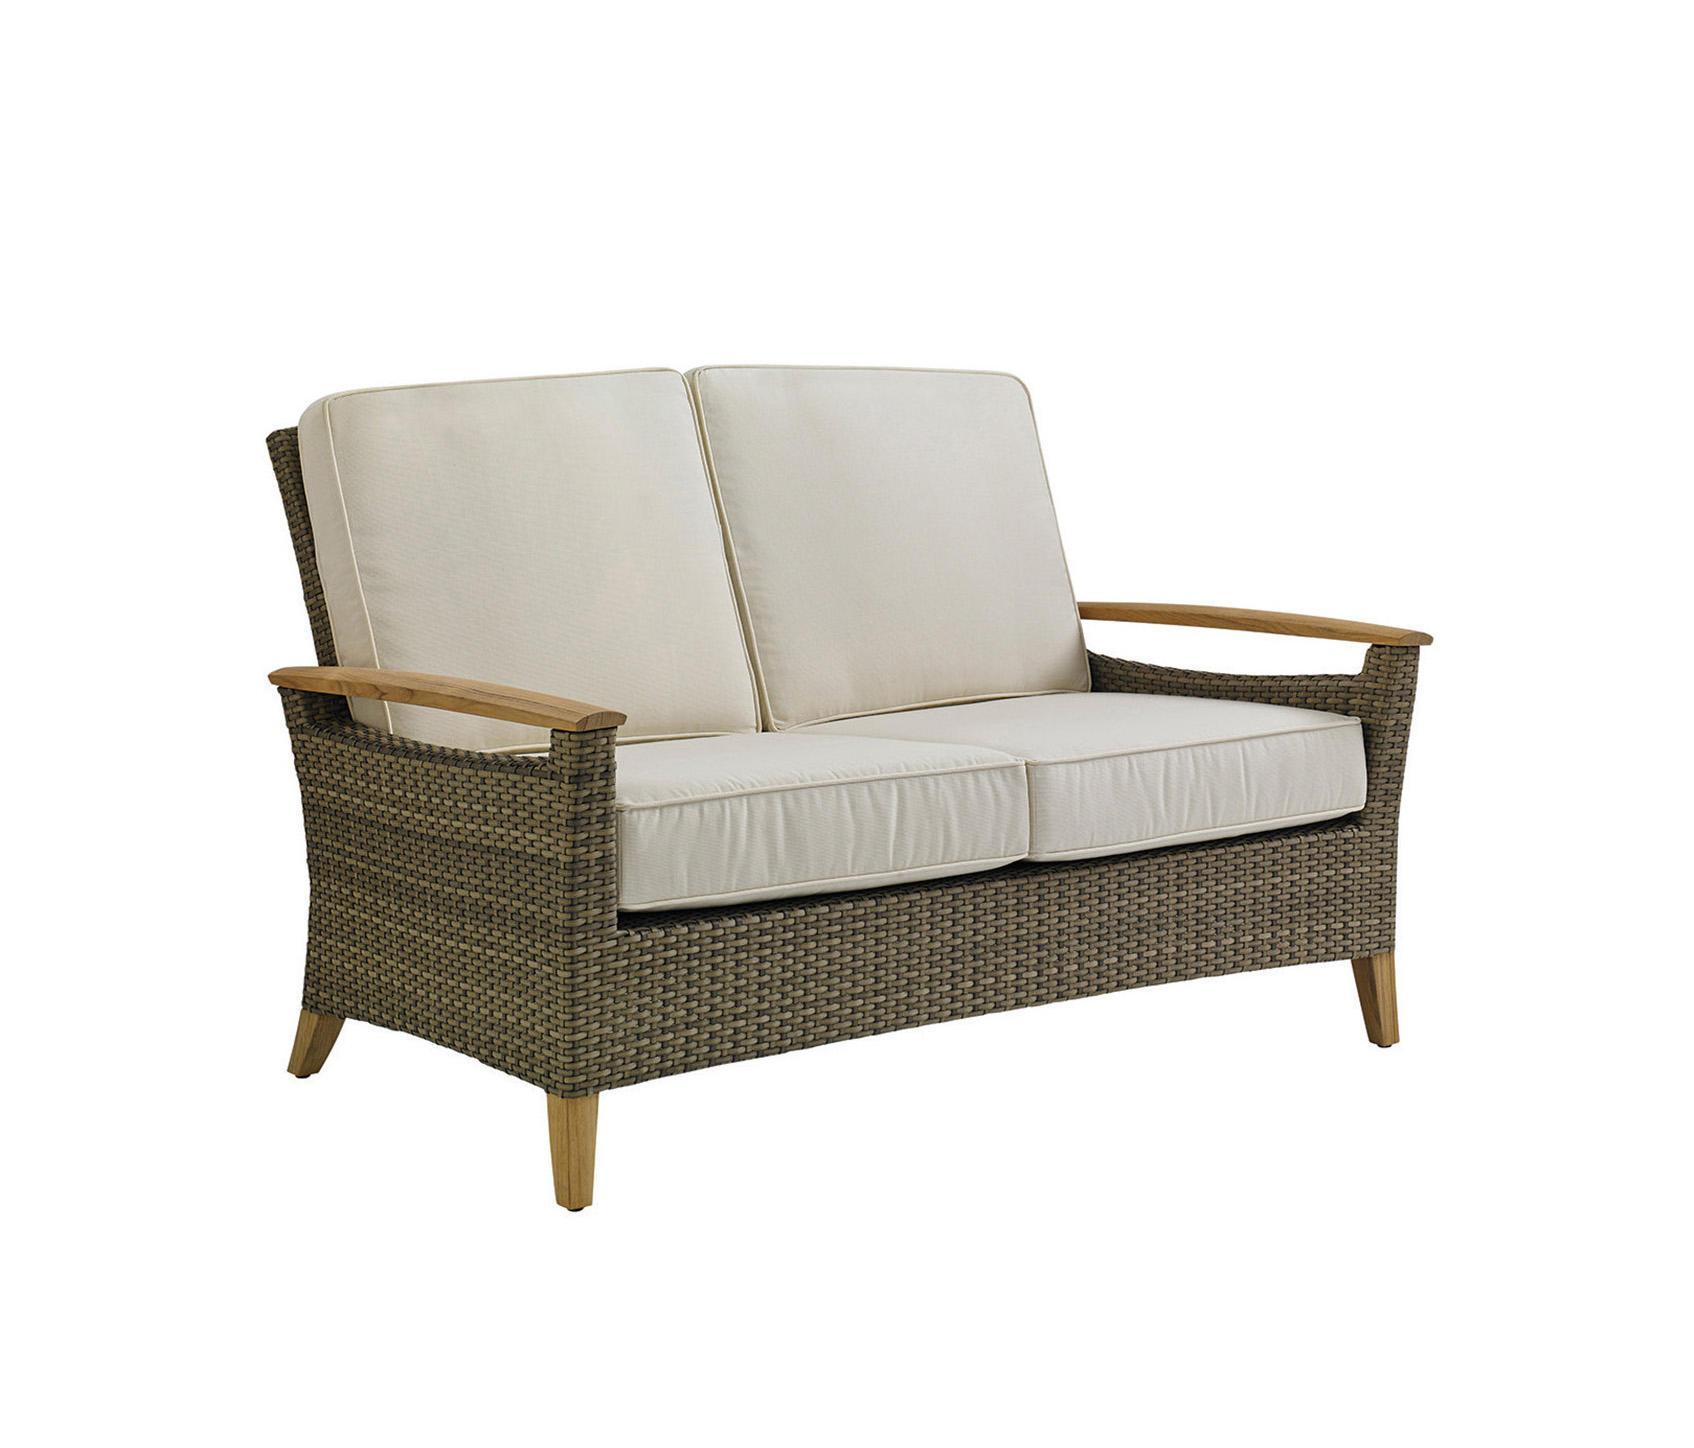 Pepper Marsh 2 Seater Sofa Gartensofas Von Gloster Furniture Gmbh Architonic